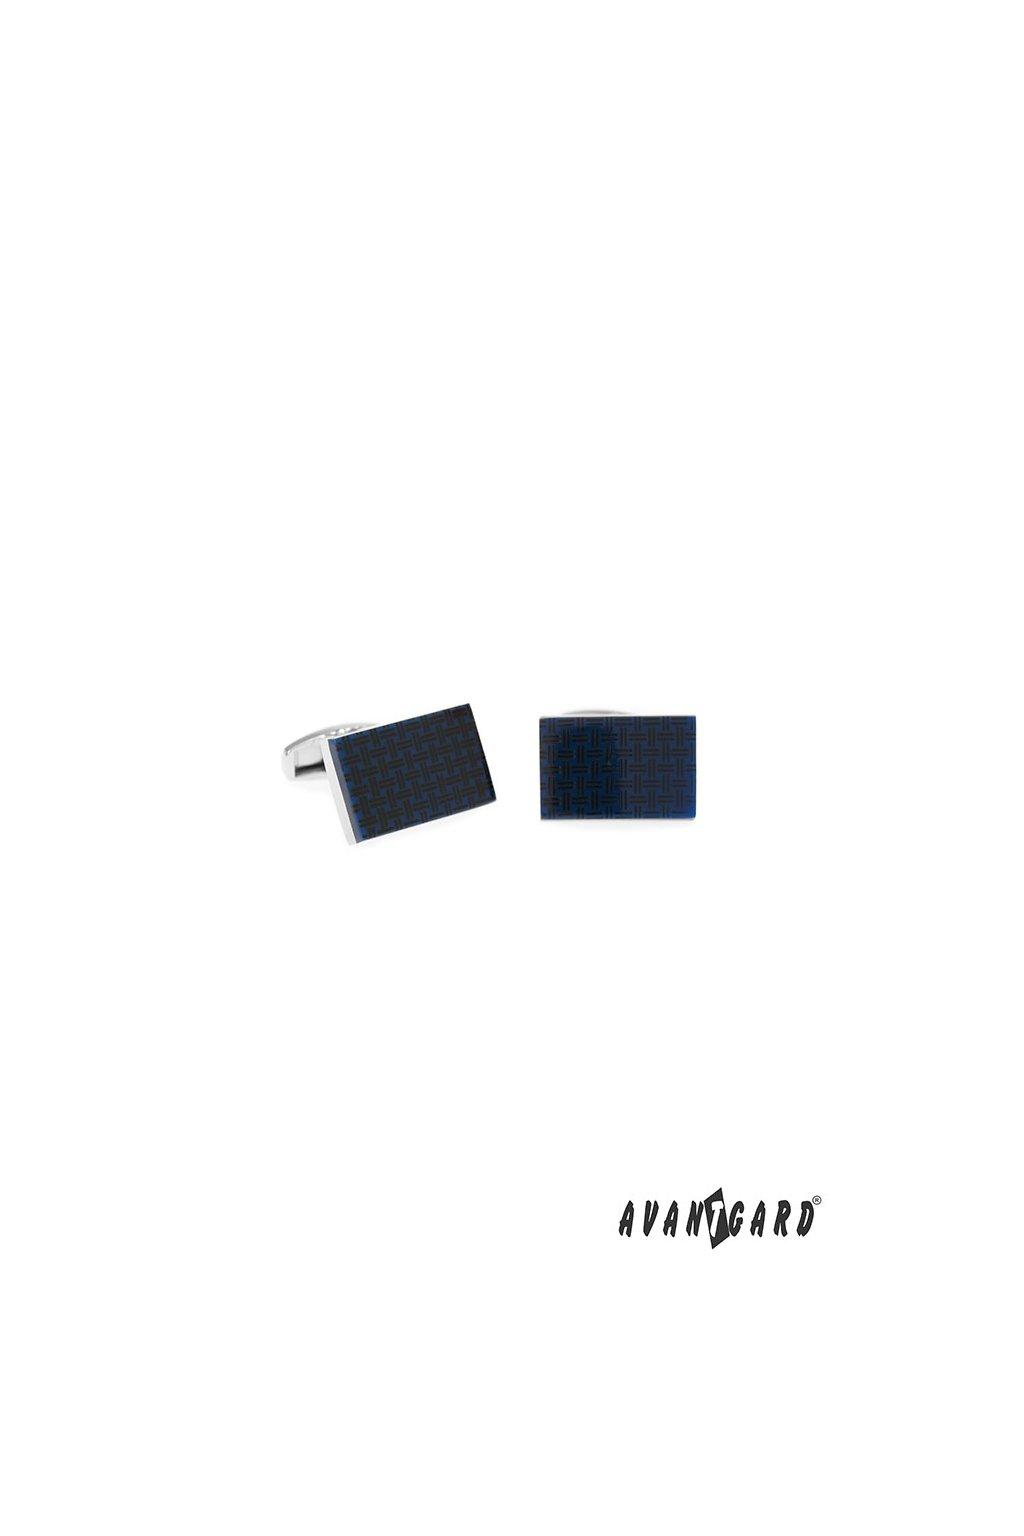 Manžetové knoflíčky PREMIUM, 573-20760, Stříbrná lesk/modrá